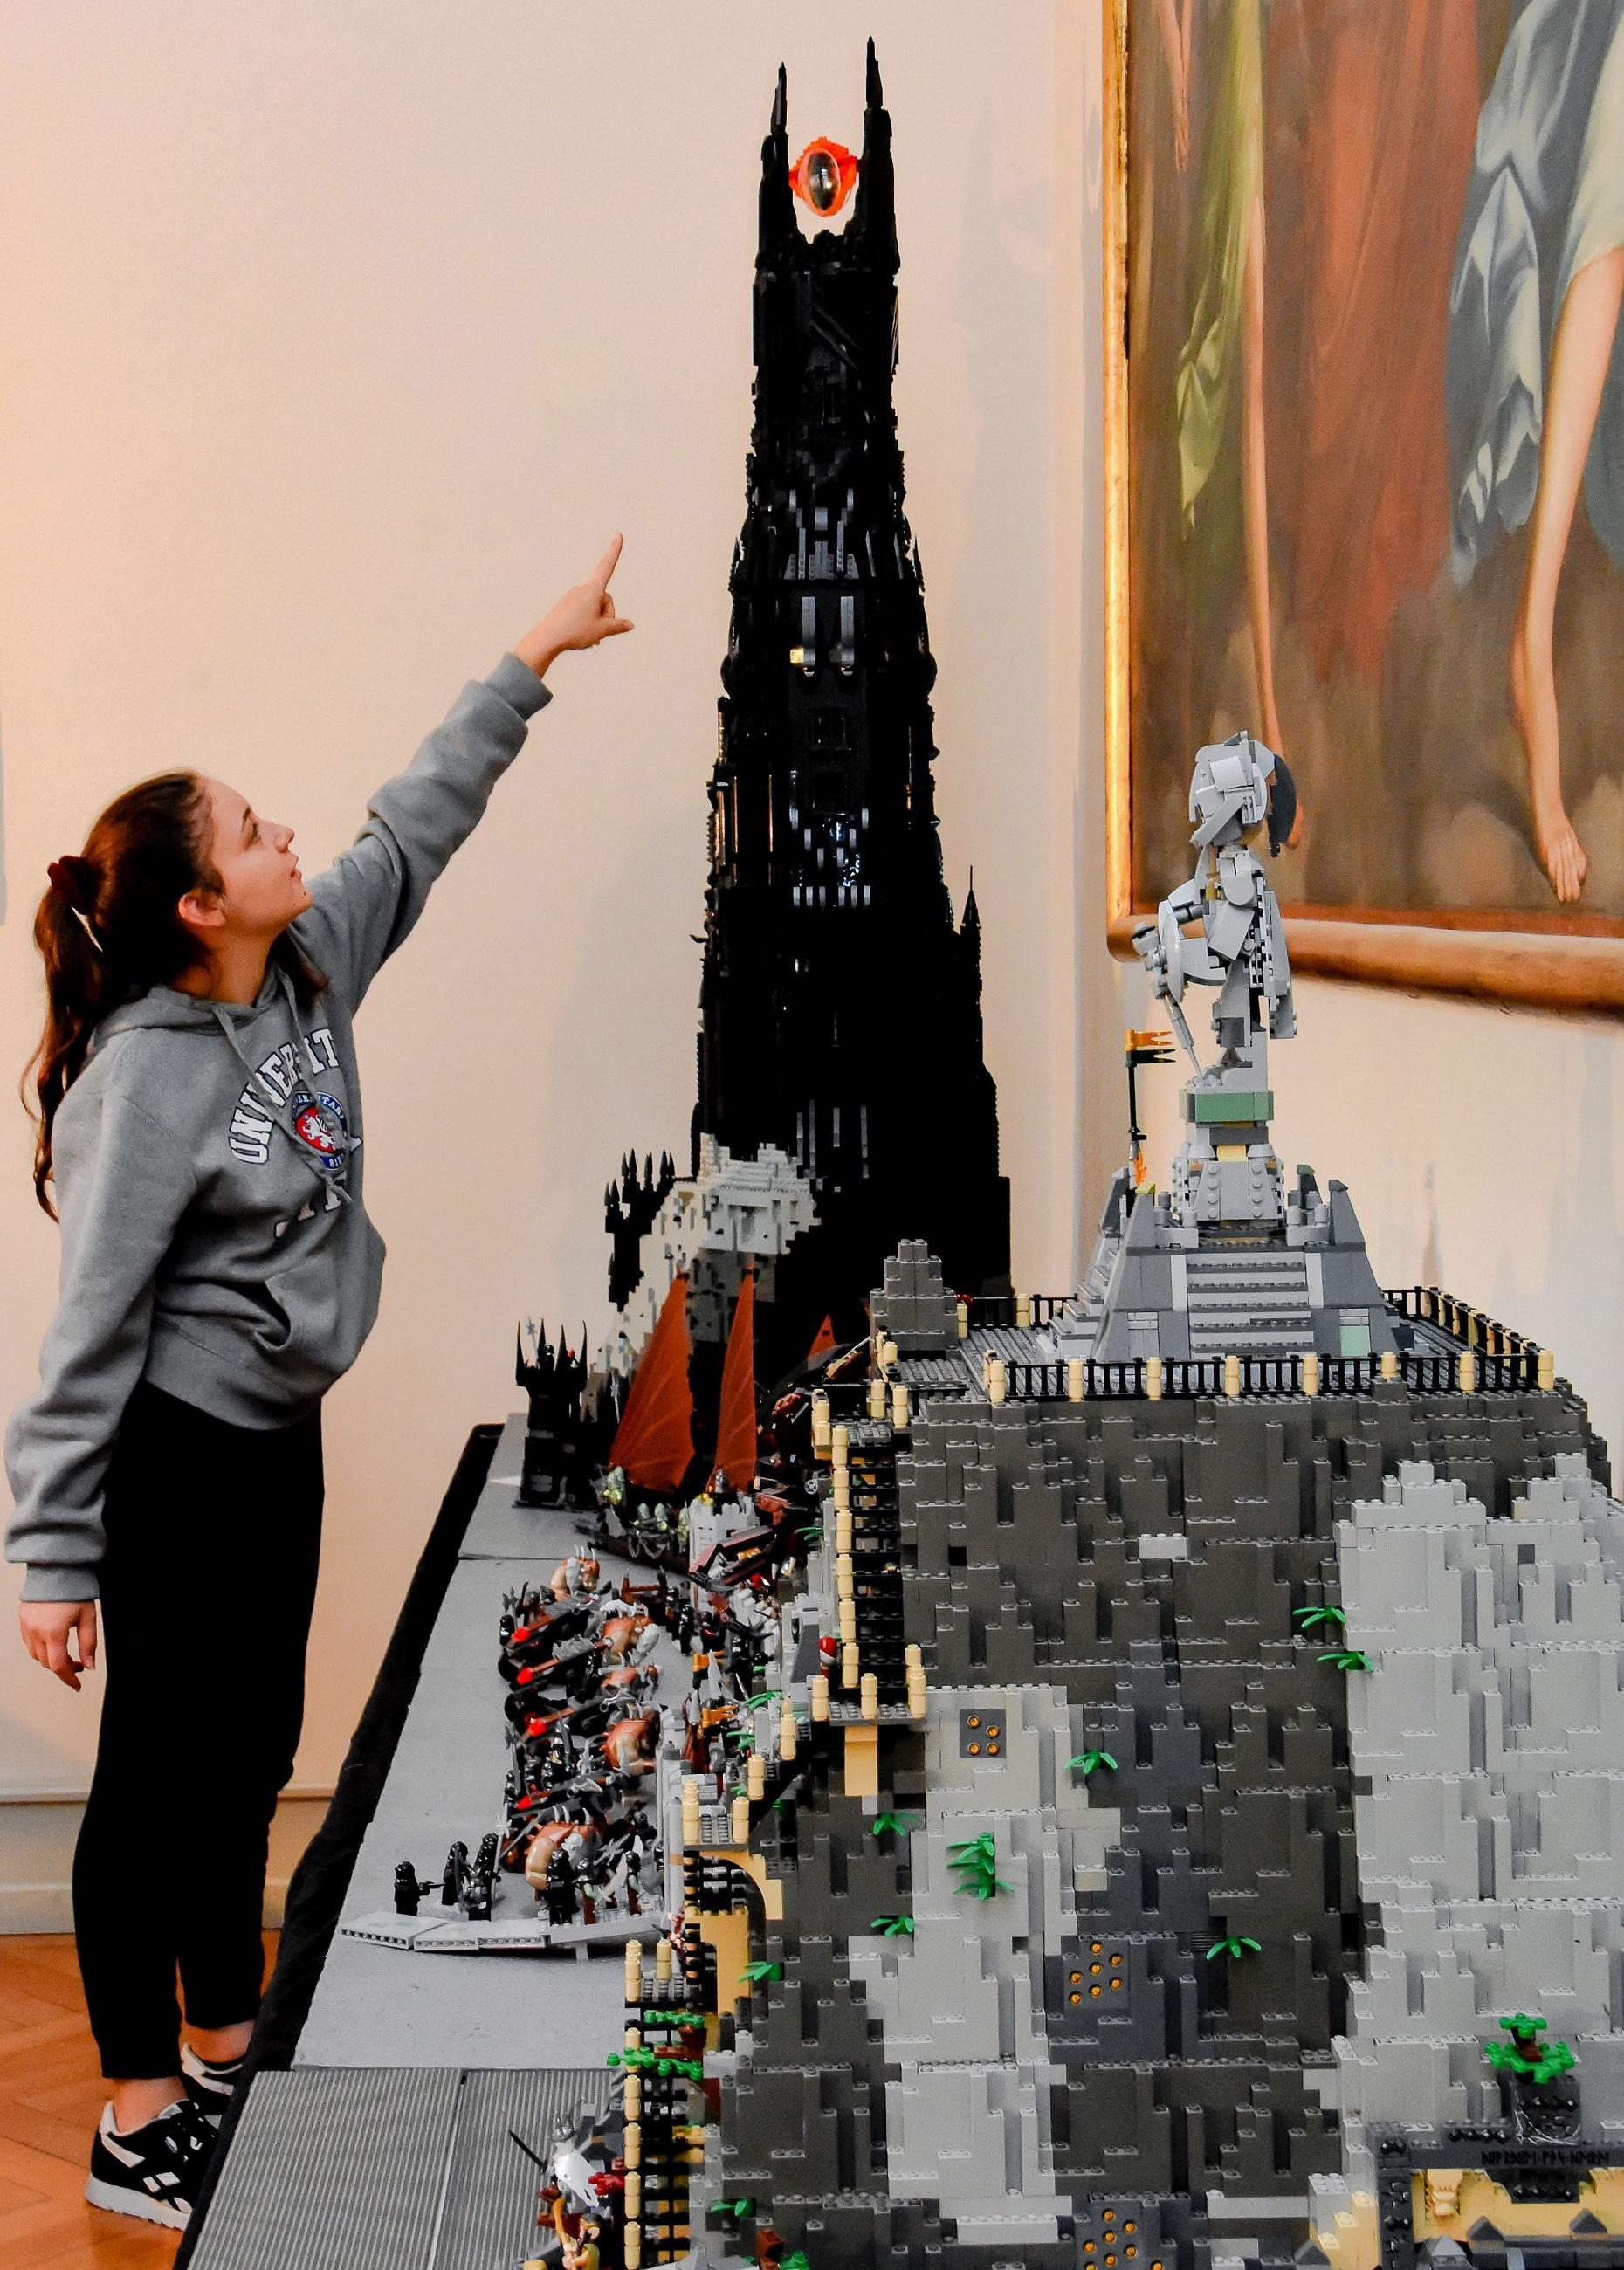 24 ludwigsburg event faszination lego 2017 1 foto angelika peetz bilderschoen ssg pressebild